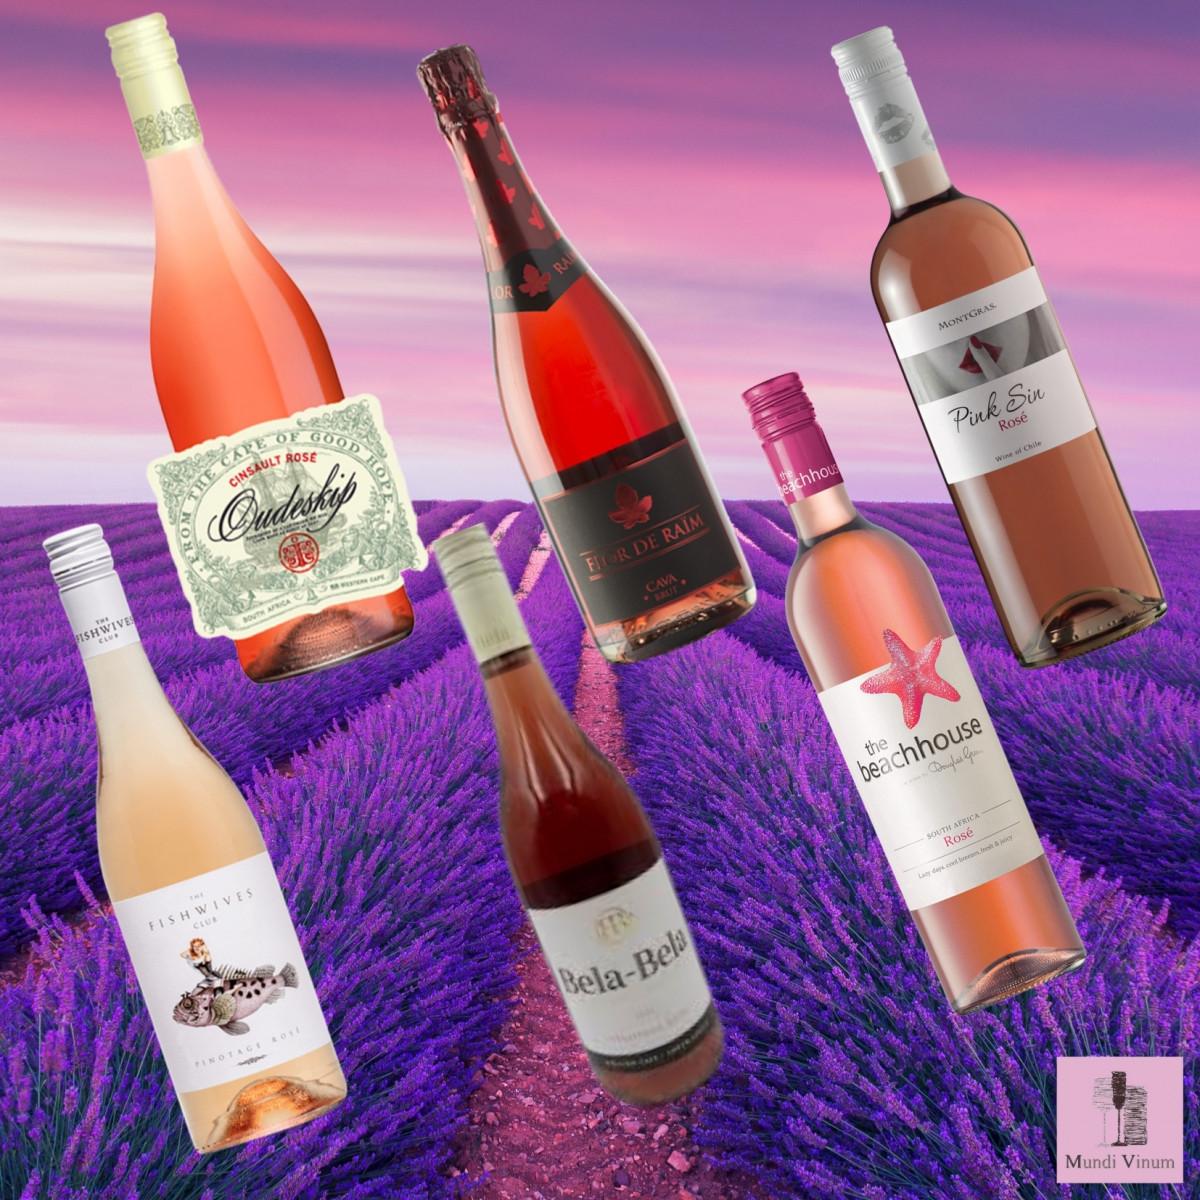 Rosé proefpakketten bij Mundi Vinum